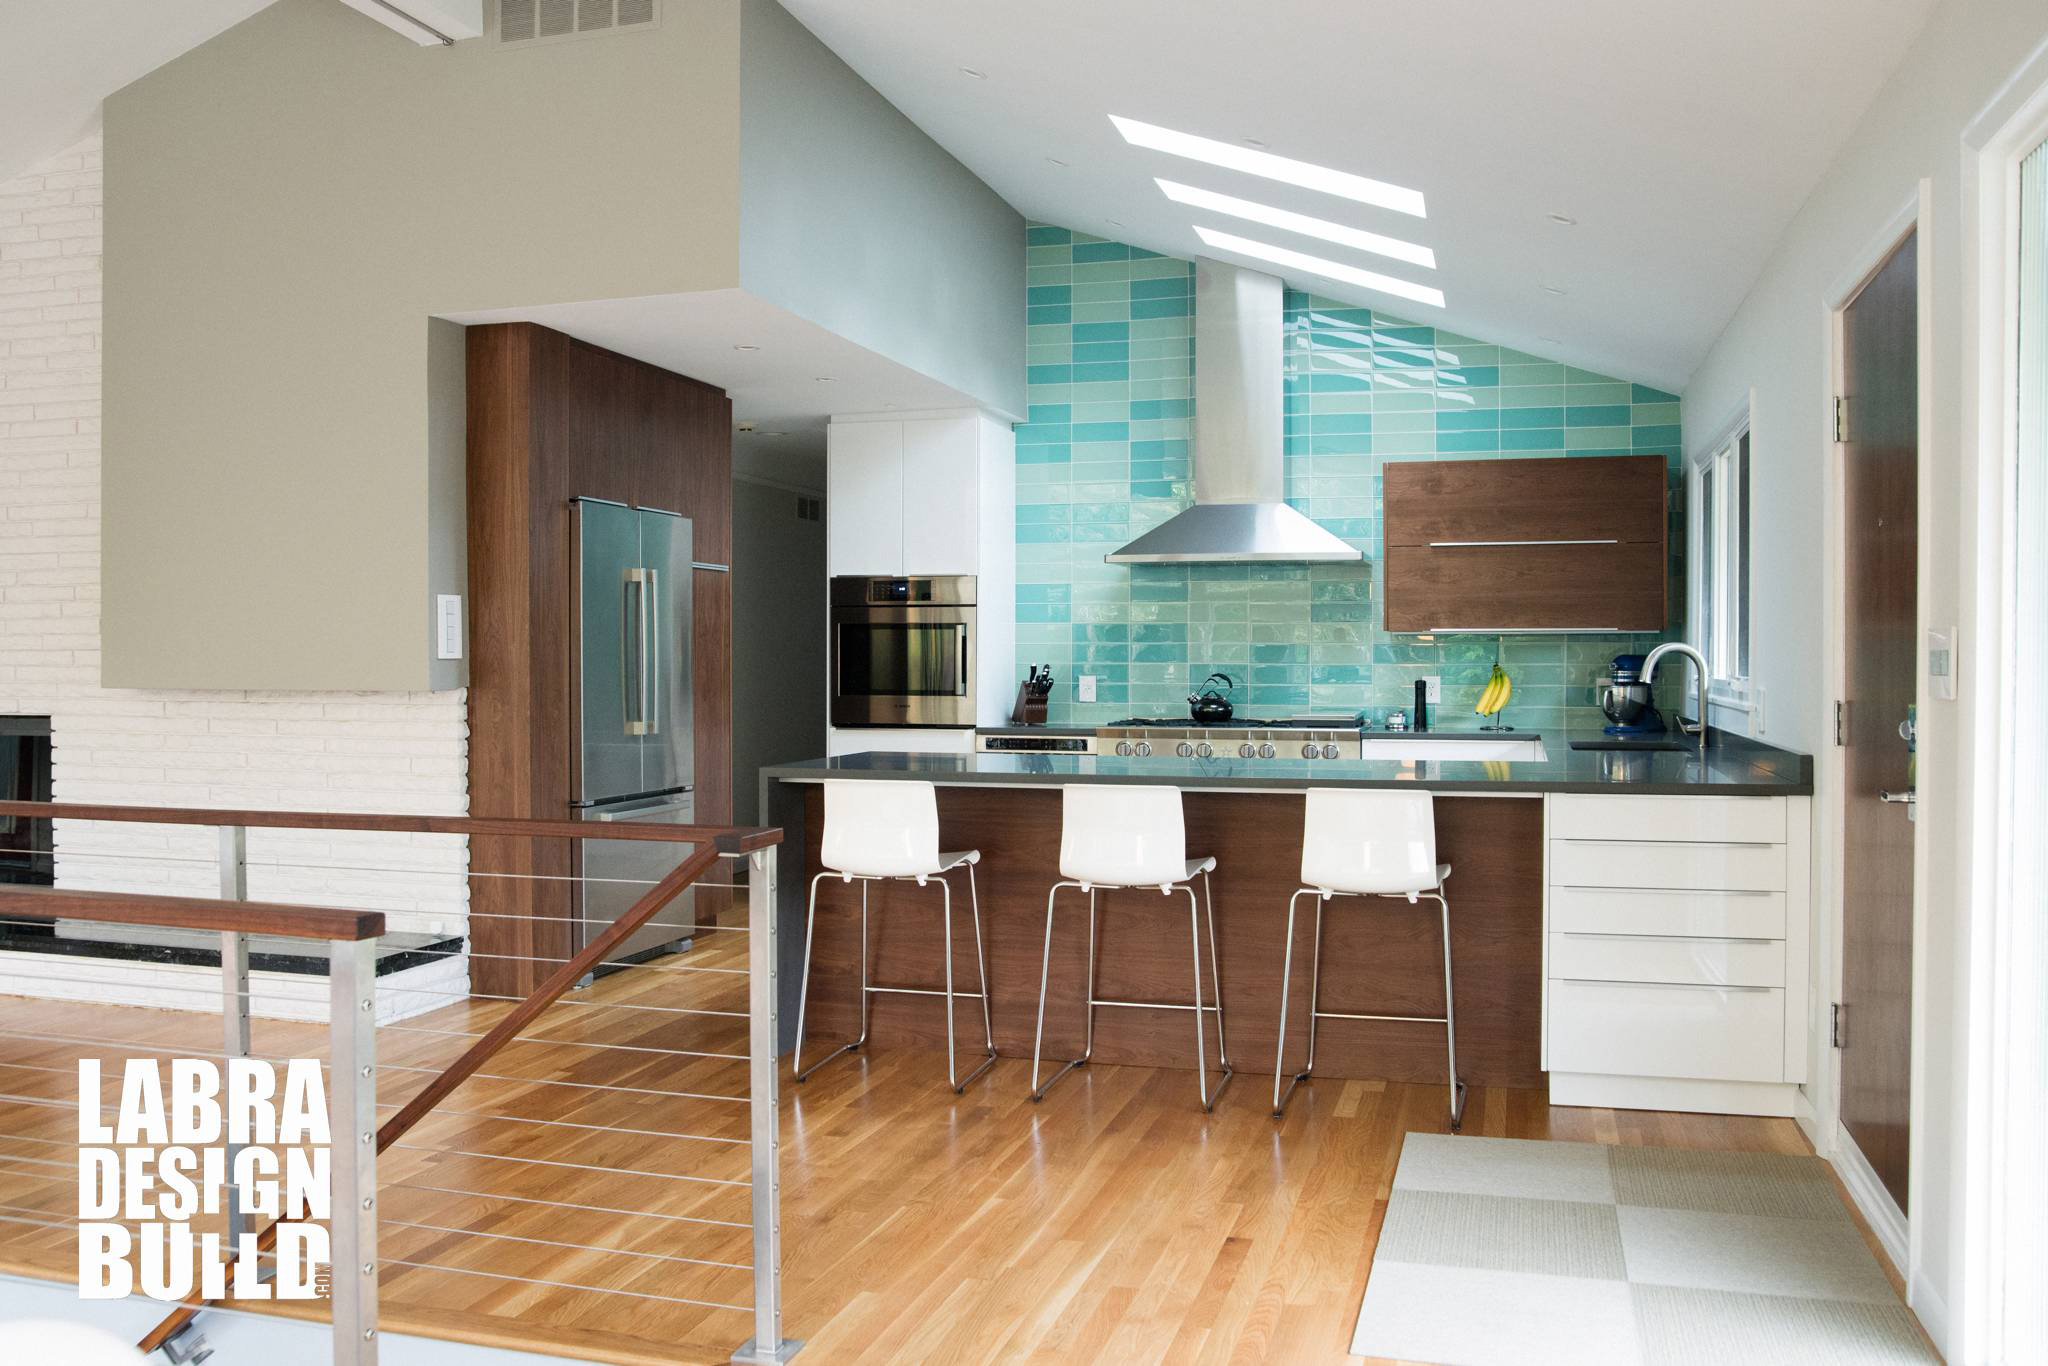 kitchen remodeling birmingham mi hotel with hong kong modern remodel franklin michigan labra design